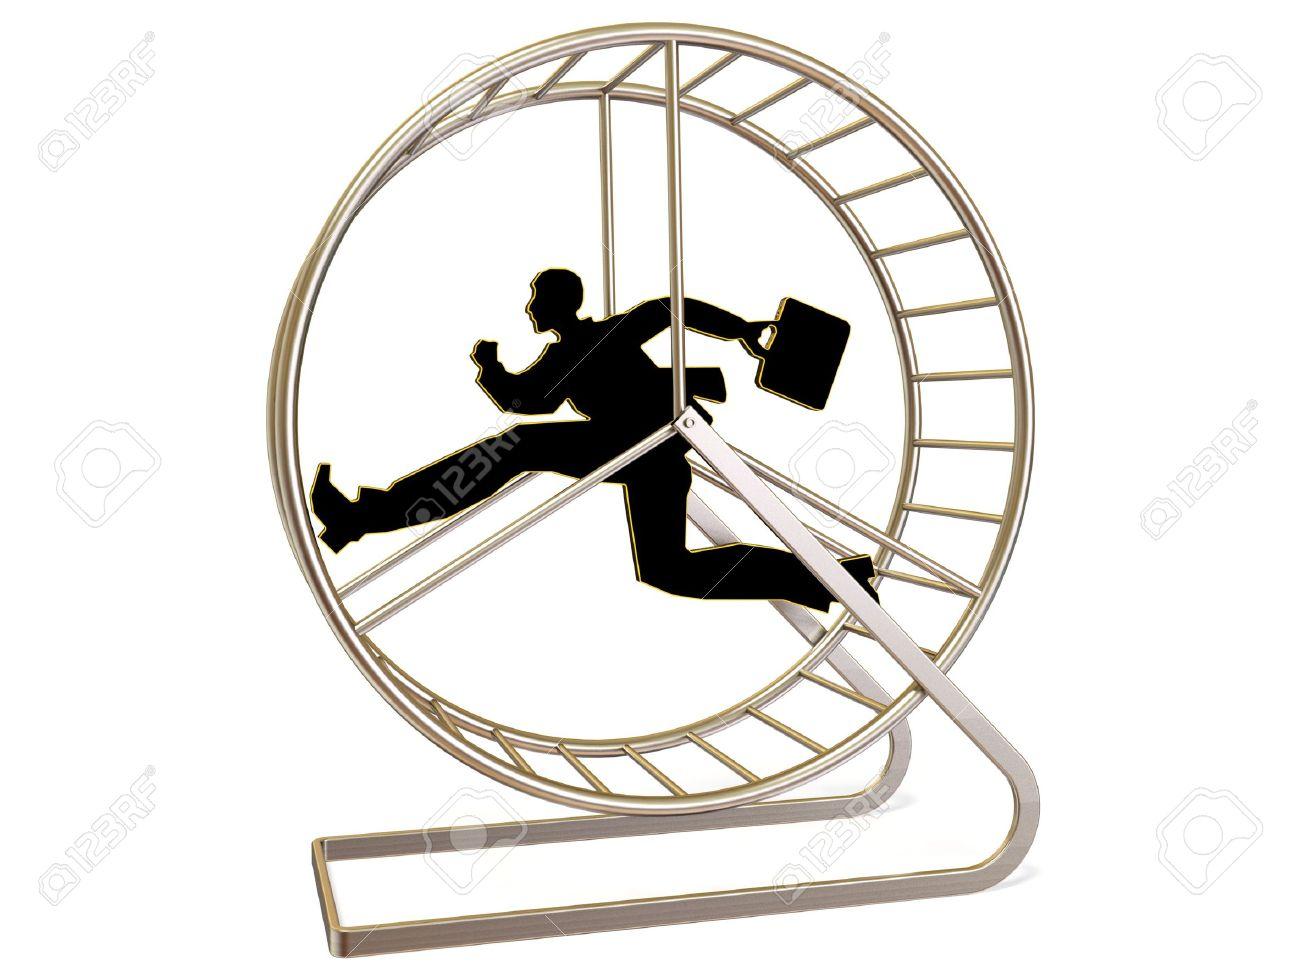 Man Running In Exercise Wheel On White Background Stock Photo.